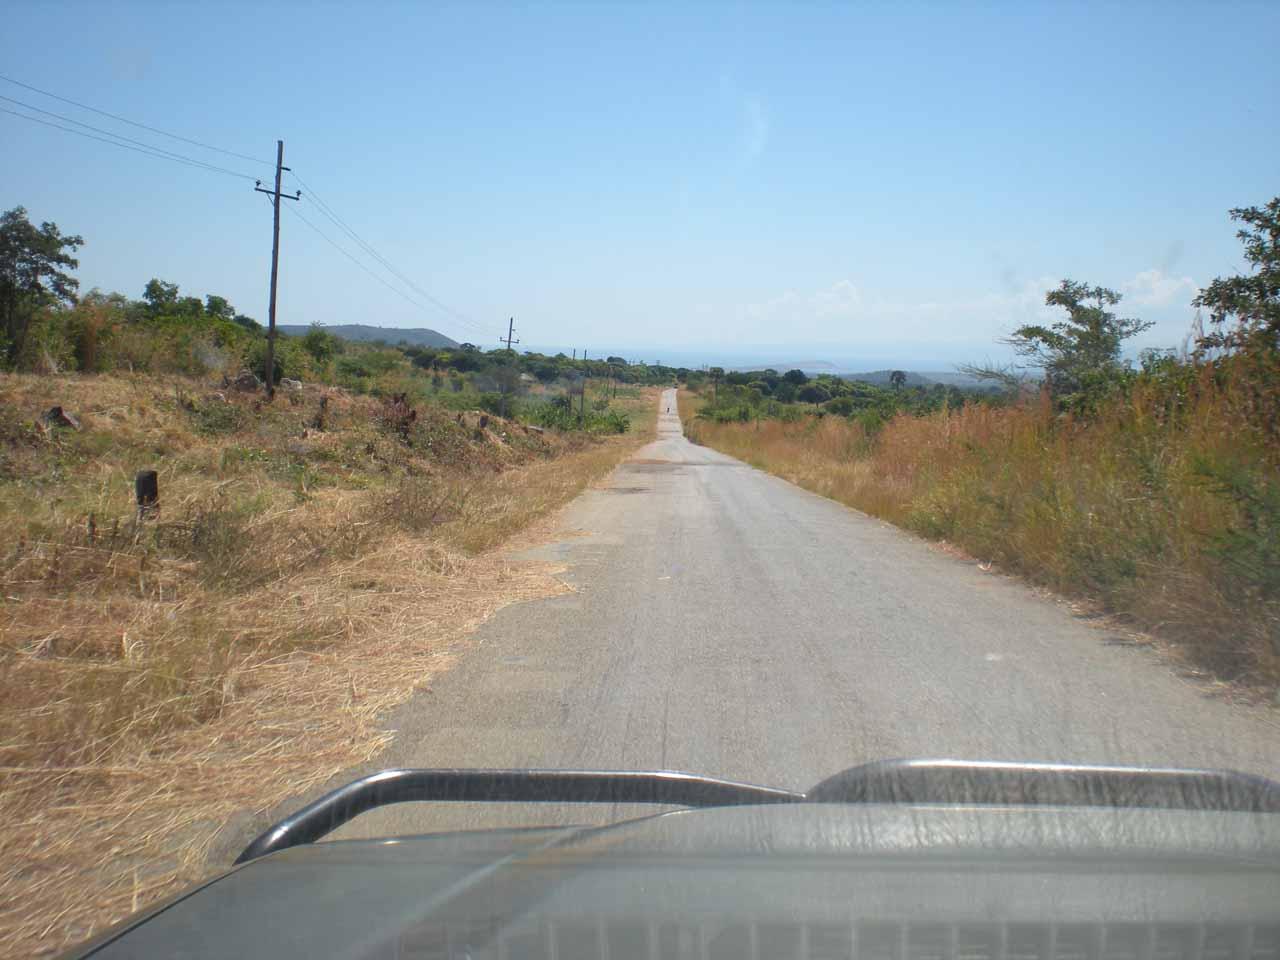 The road to Mpulungu